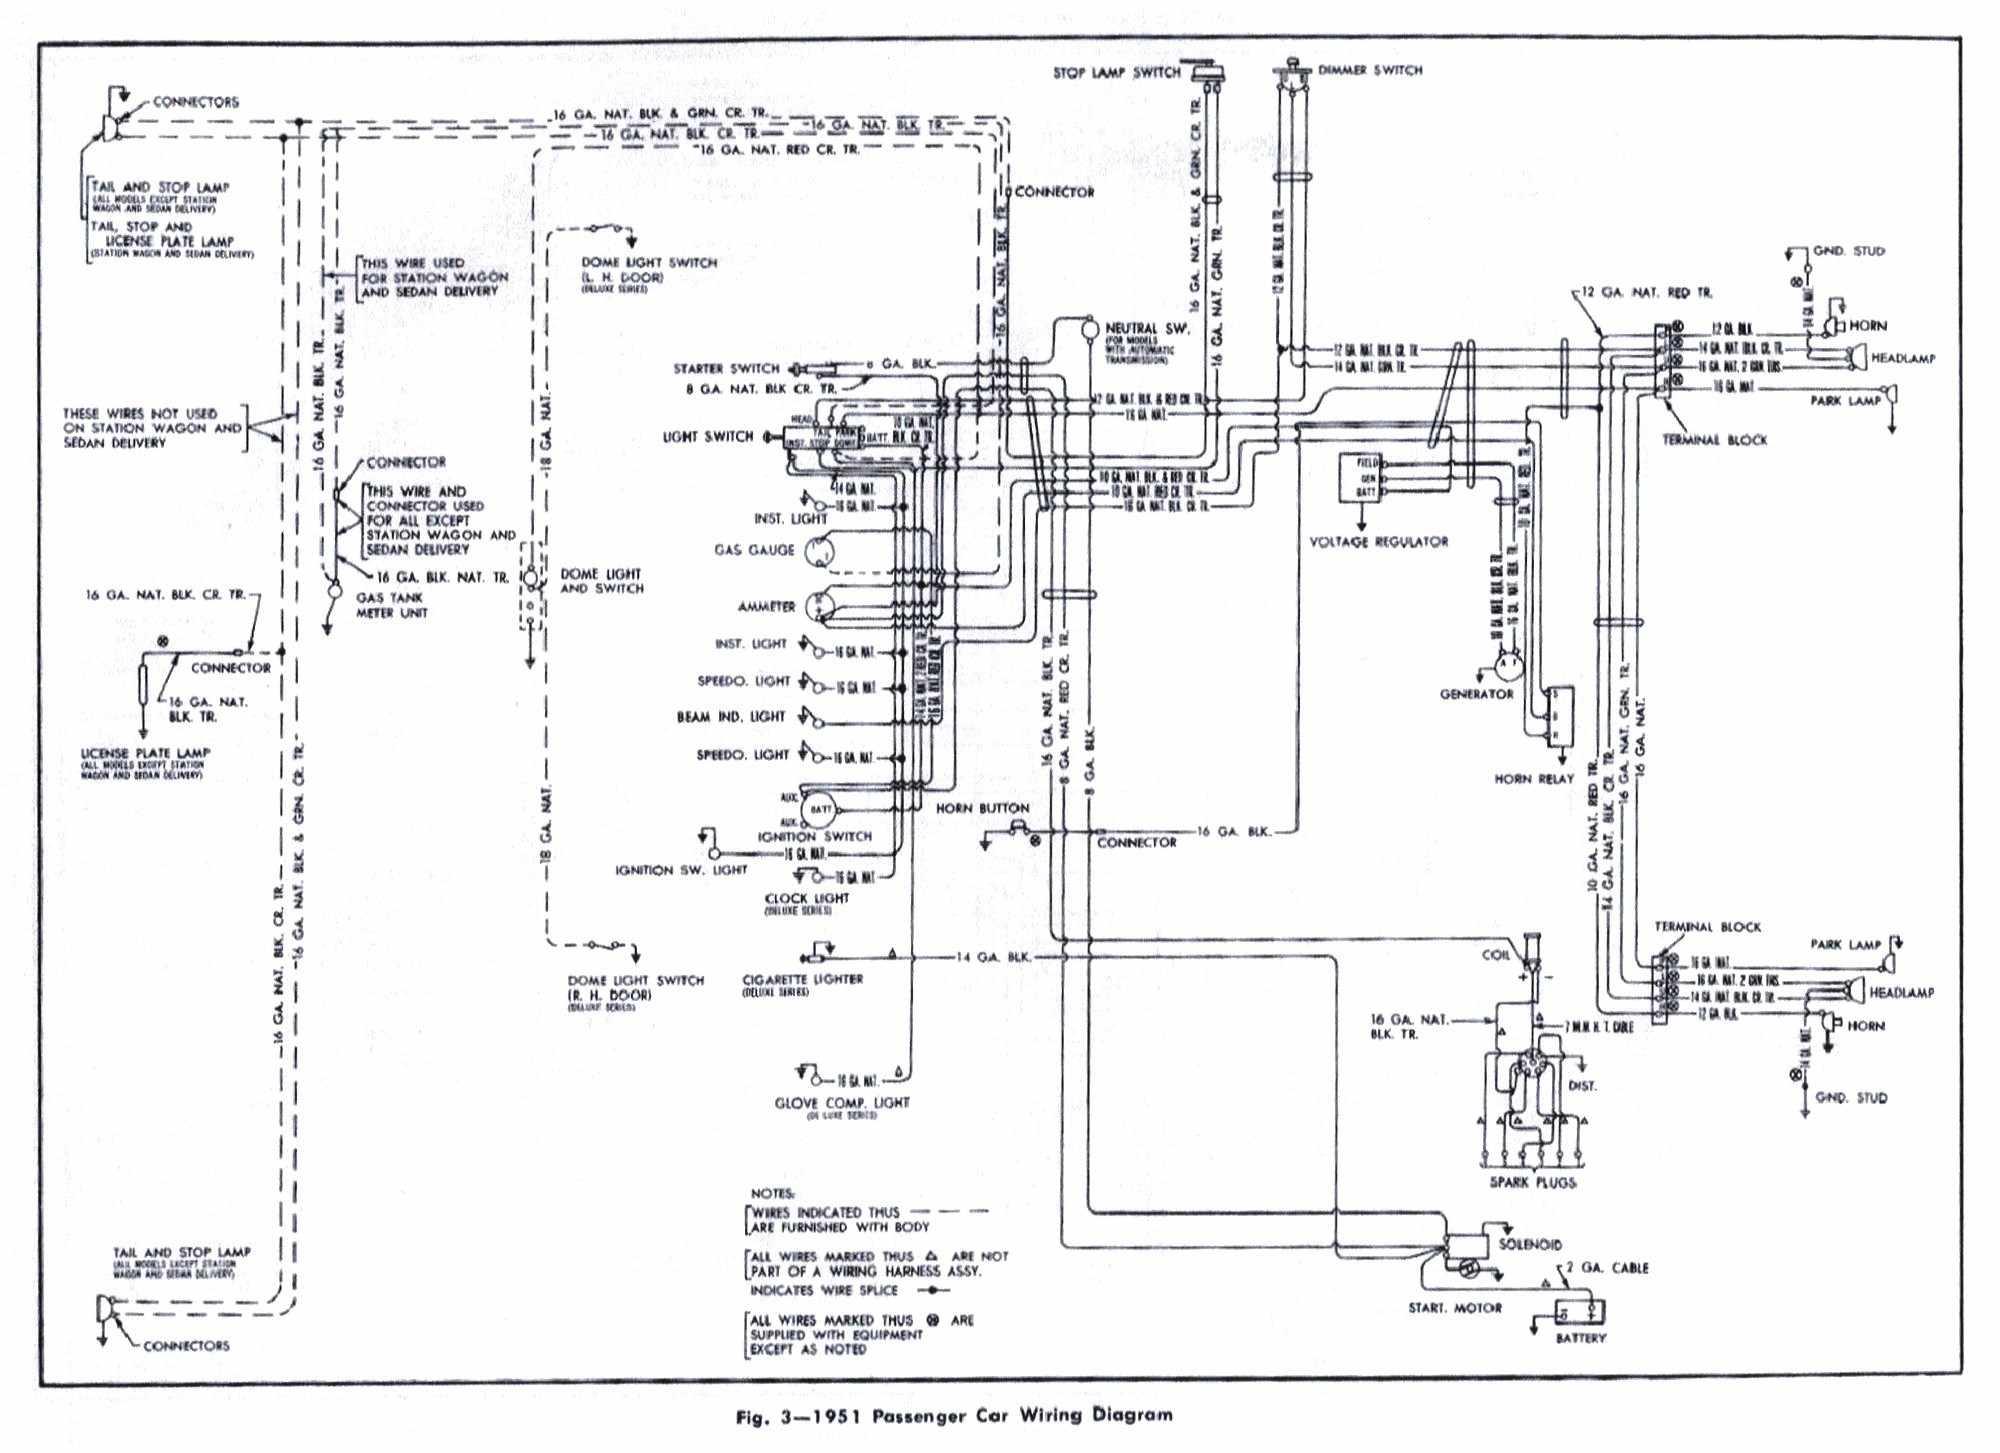 medium resolution of toyota forklift fuse box toyota forklift fuse box location yale gps tracking map at runnan fuse